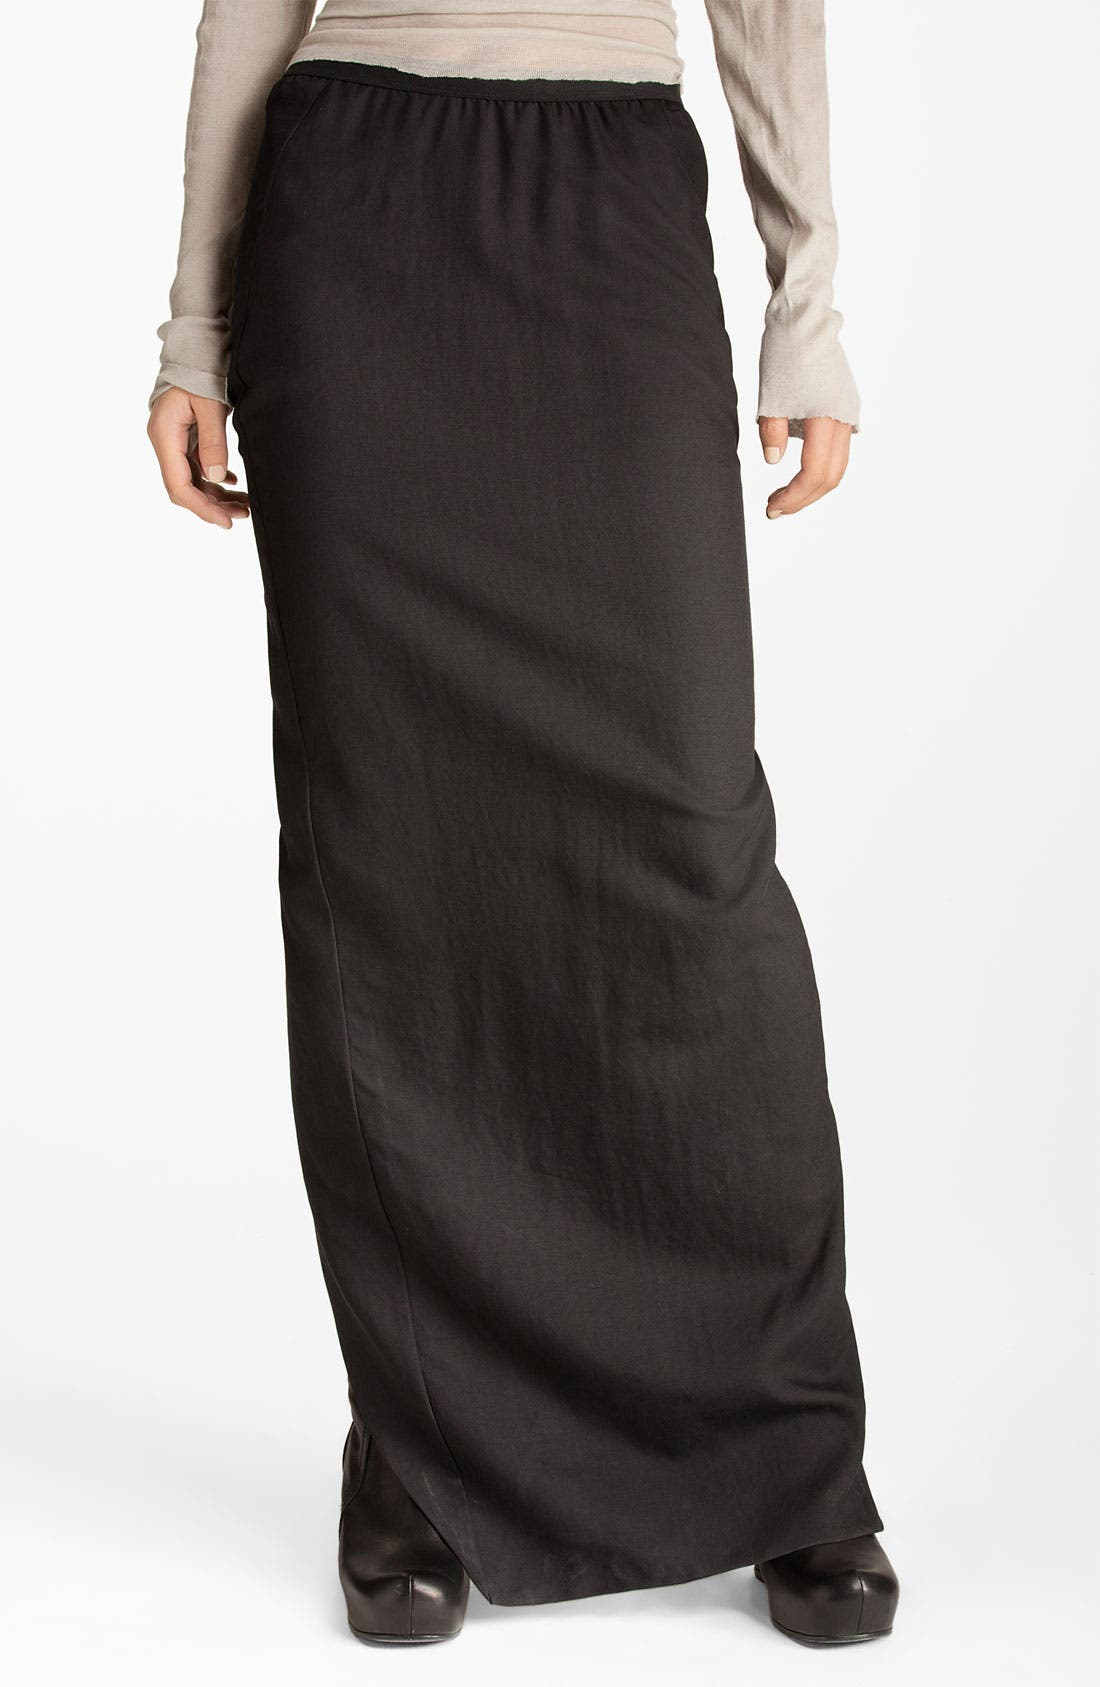 Alternate Image 1 Selected - Rick Owens Slit Maxi Skirt